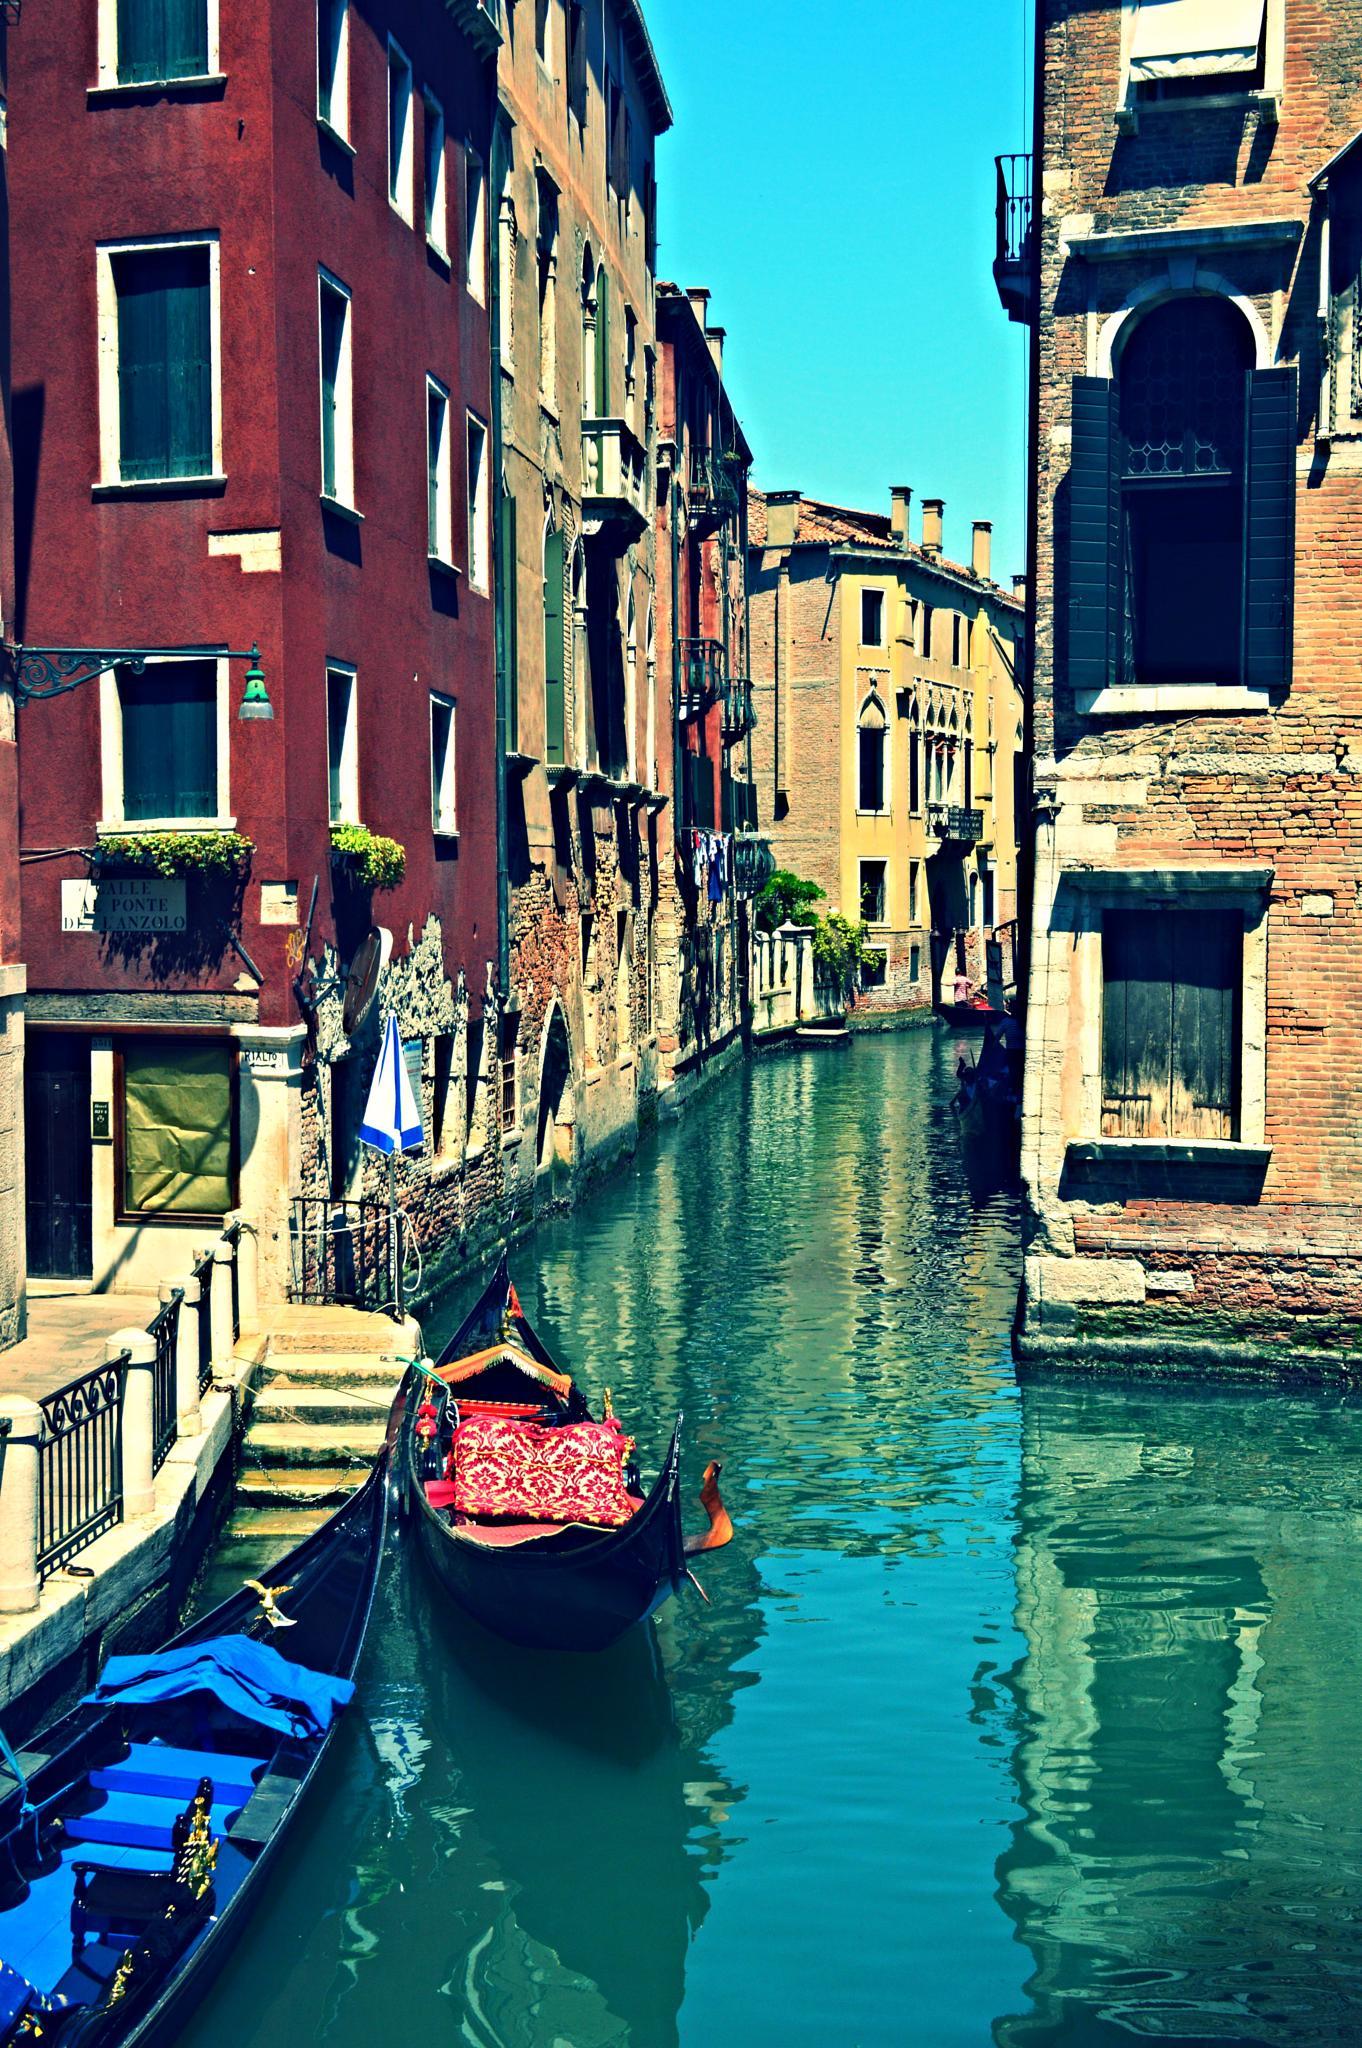 Venice, Italy by Frederico Domondon